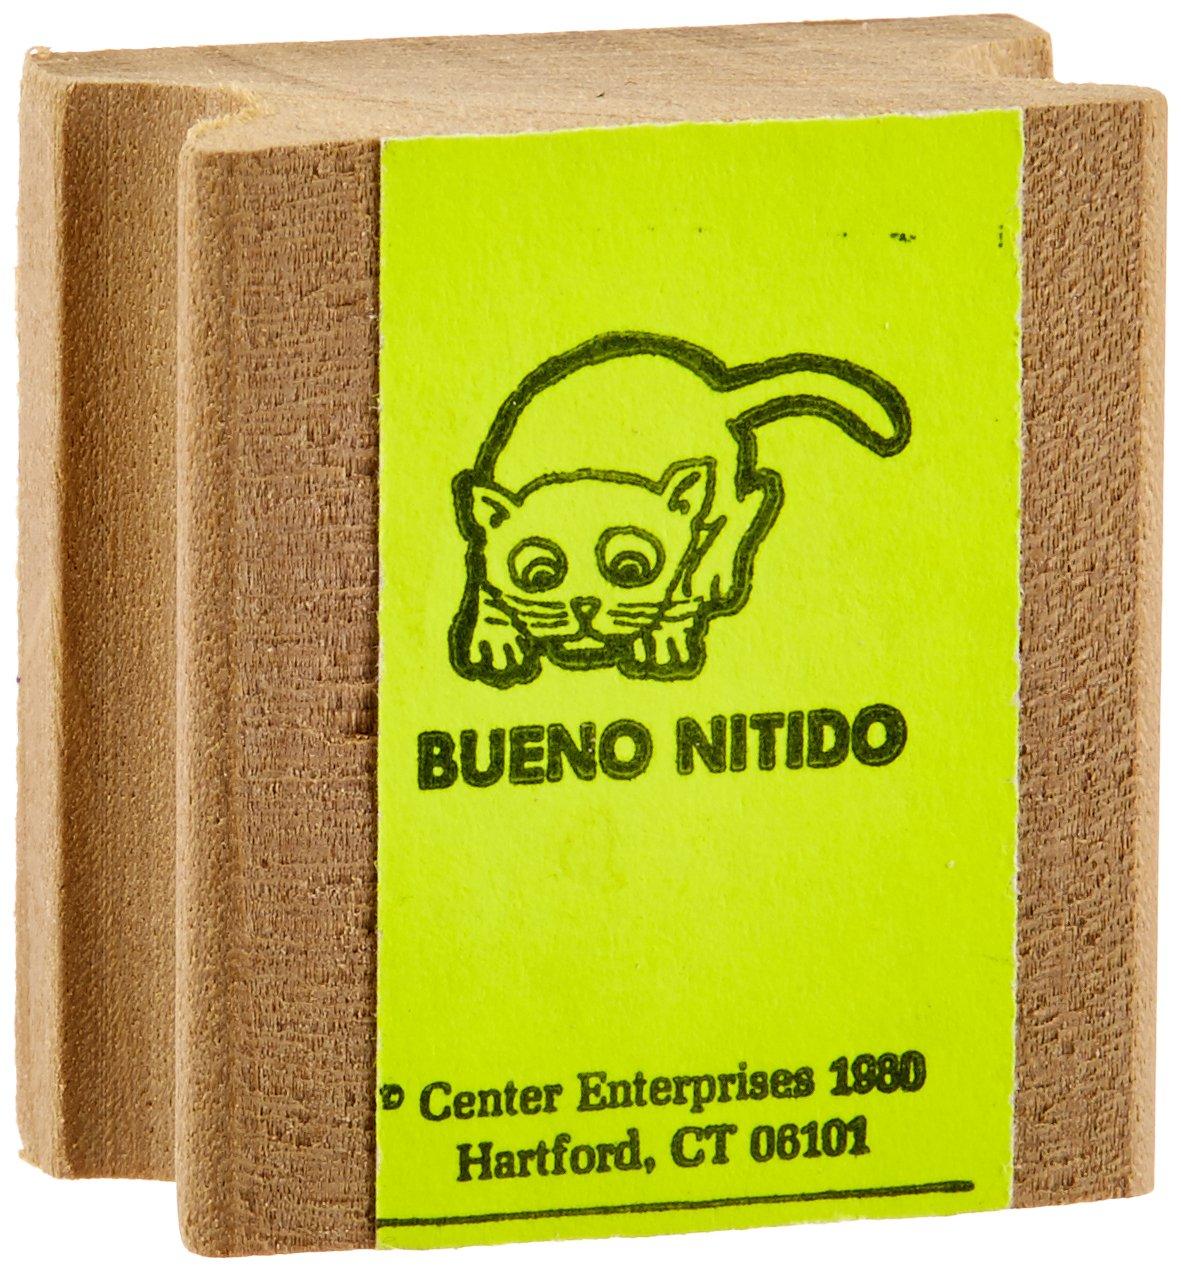 Center Enterprise CE663S'Good Work!' Stamp, Spanish